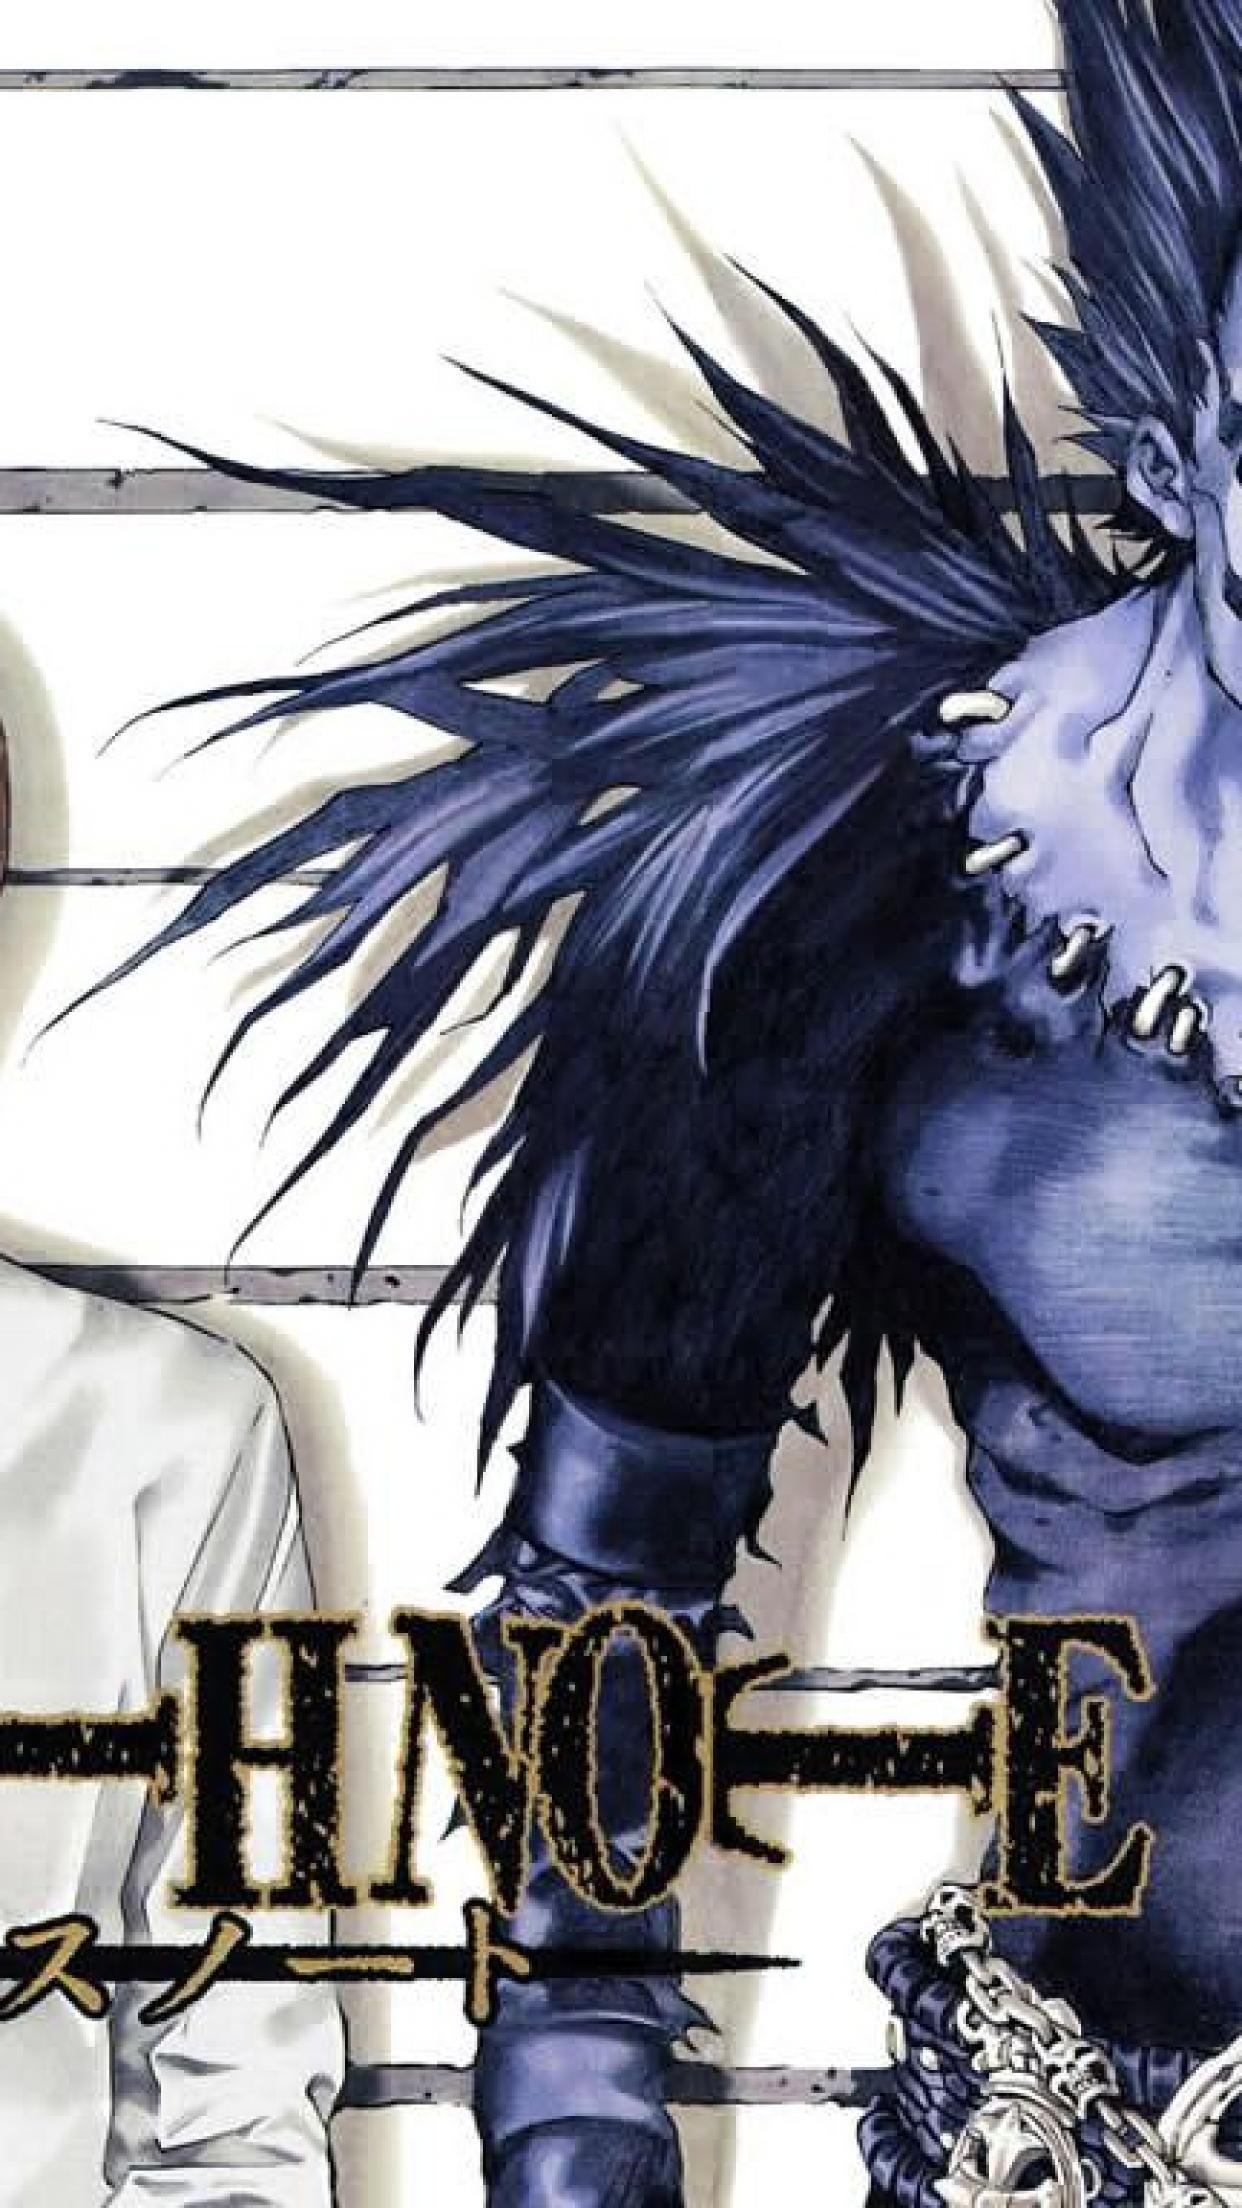 Death note anime hd wallpaper